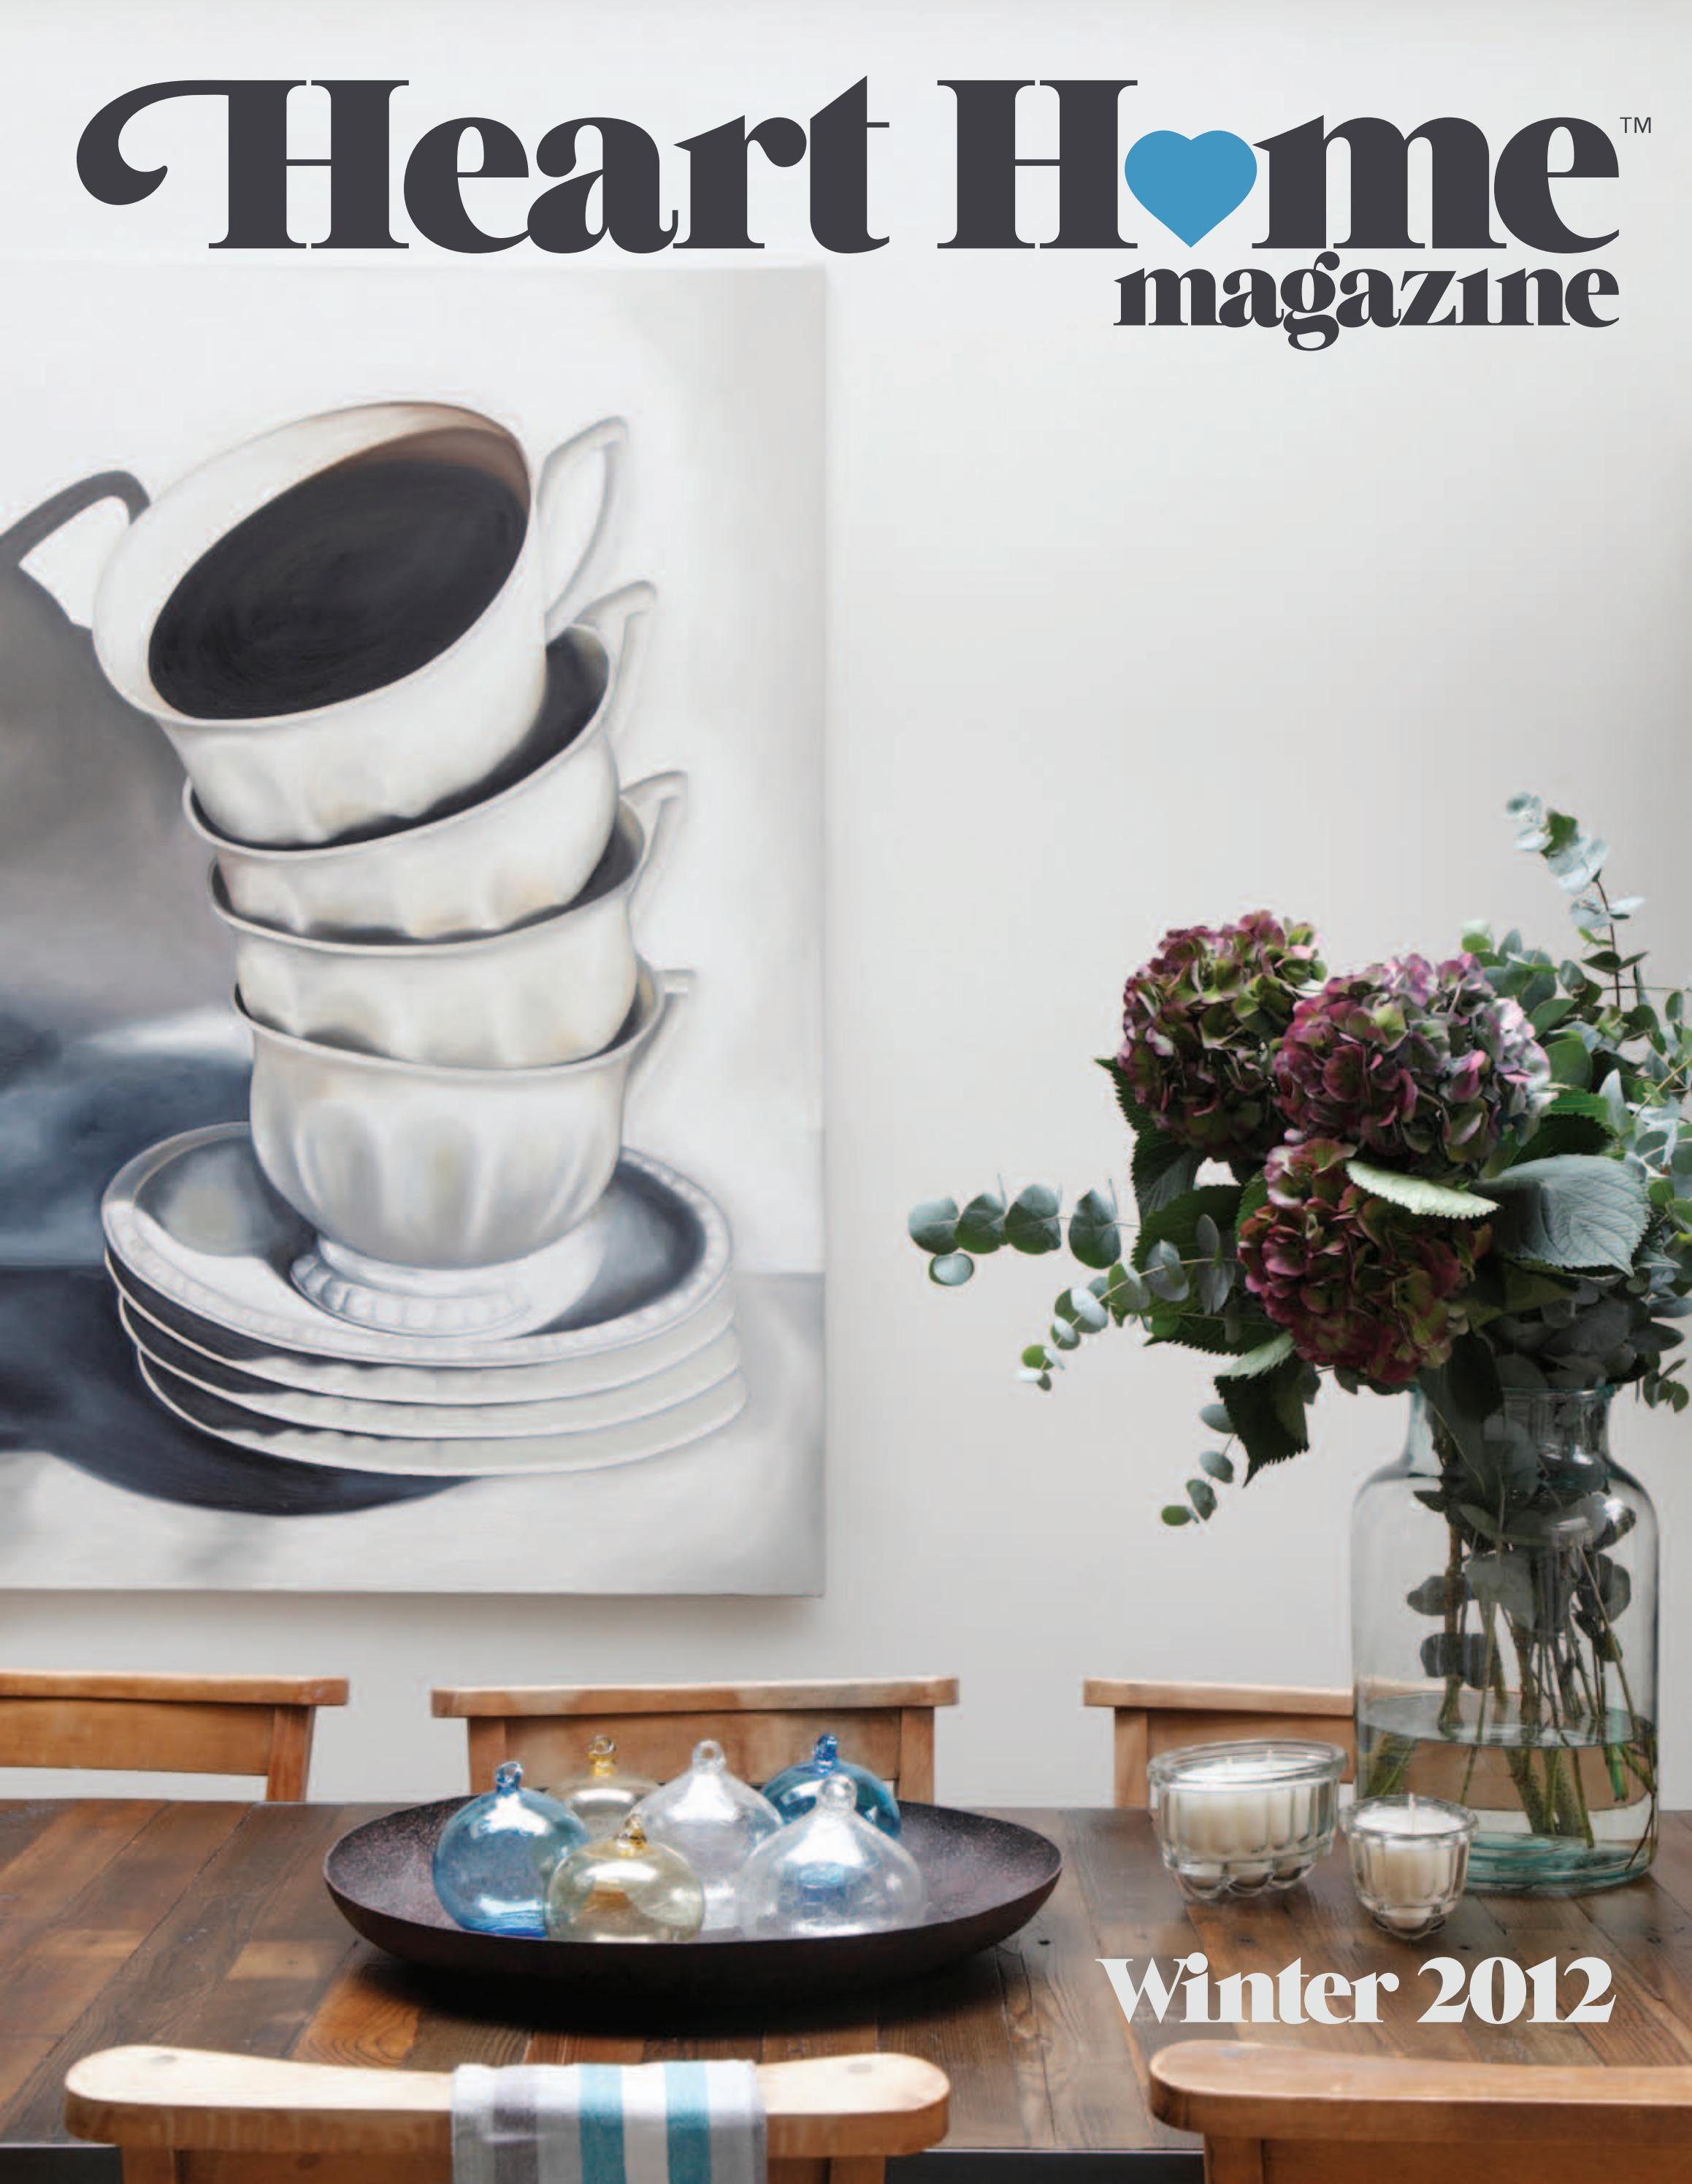 Heart Home magazine issue 20 by Heart Home magazine   issuu